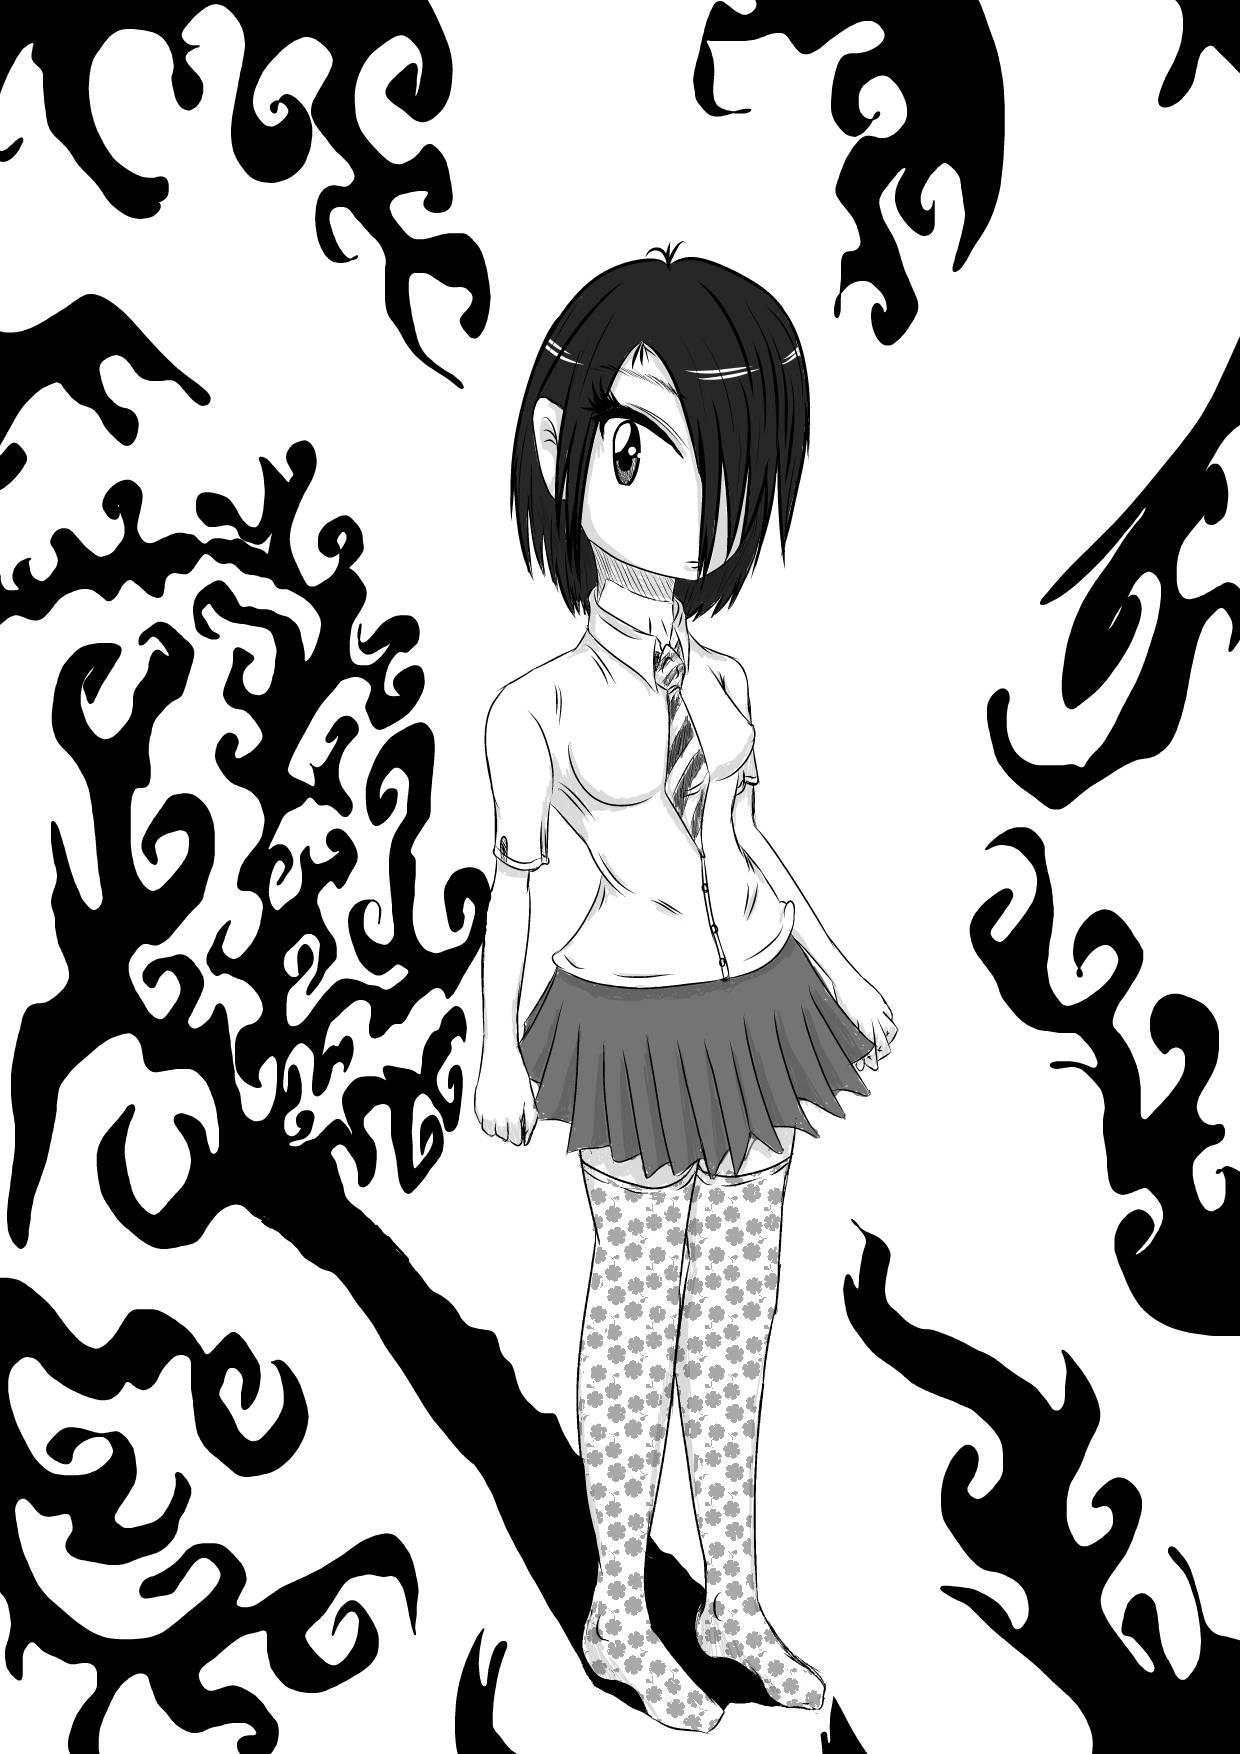 en manga studio ex 4.0